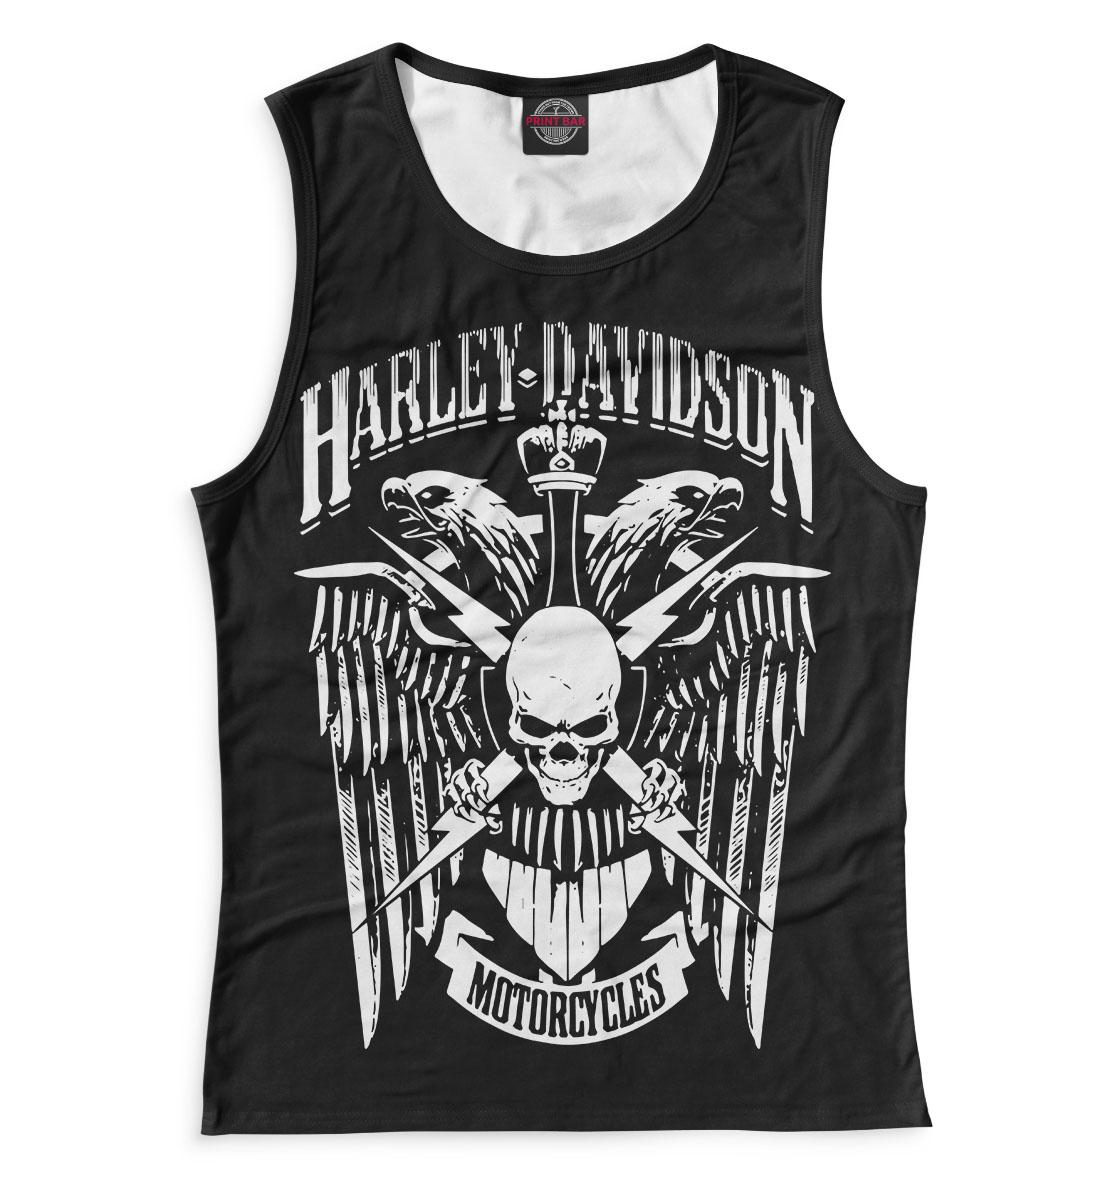 Купить Harley Davidson Motorcycles, Printbar, Майки, MTR-575884-may-1